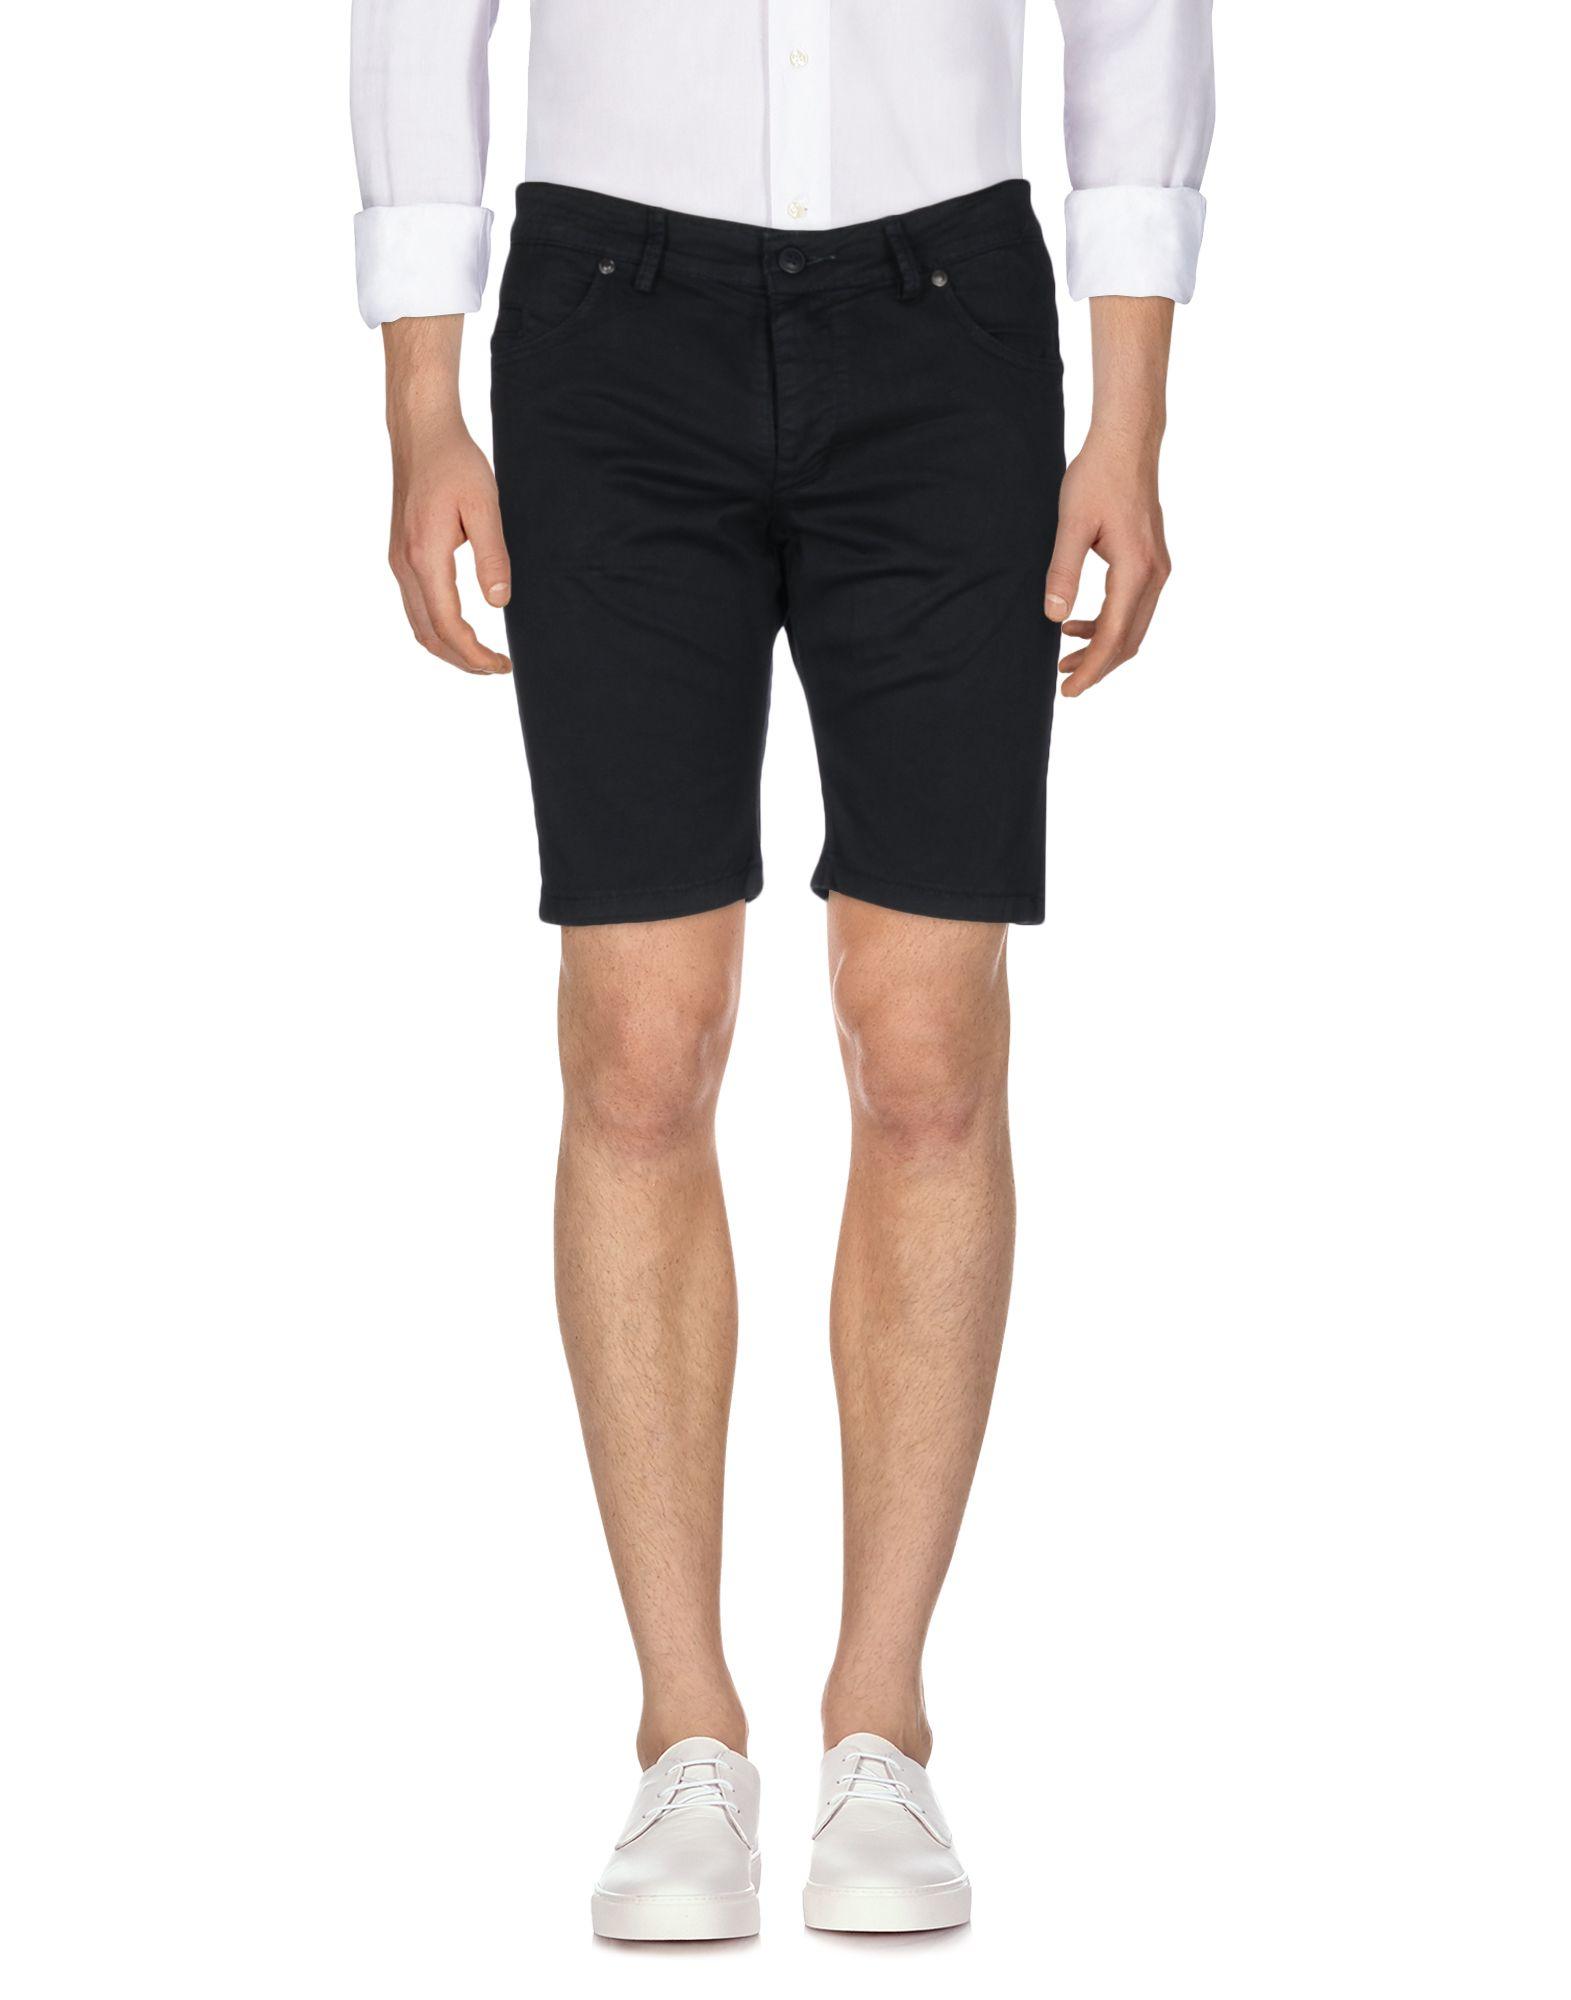 Shorts for Men On Sale, Dark Blue, Cotton, 2017, 28 29 32 33 34 35 38 40 Bomboogie